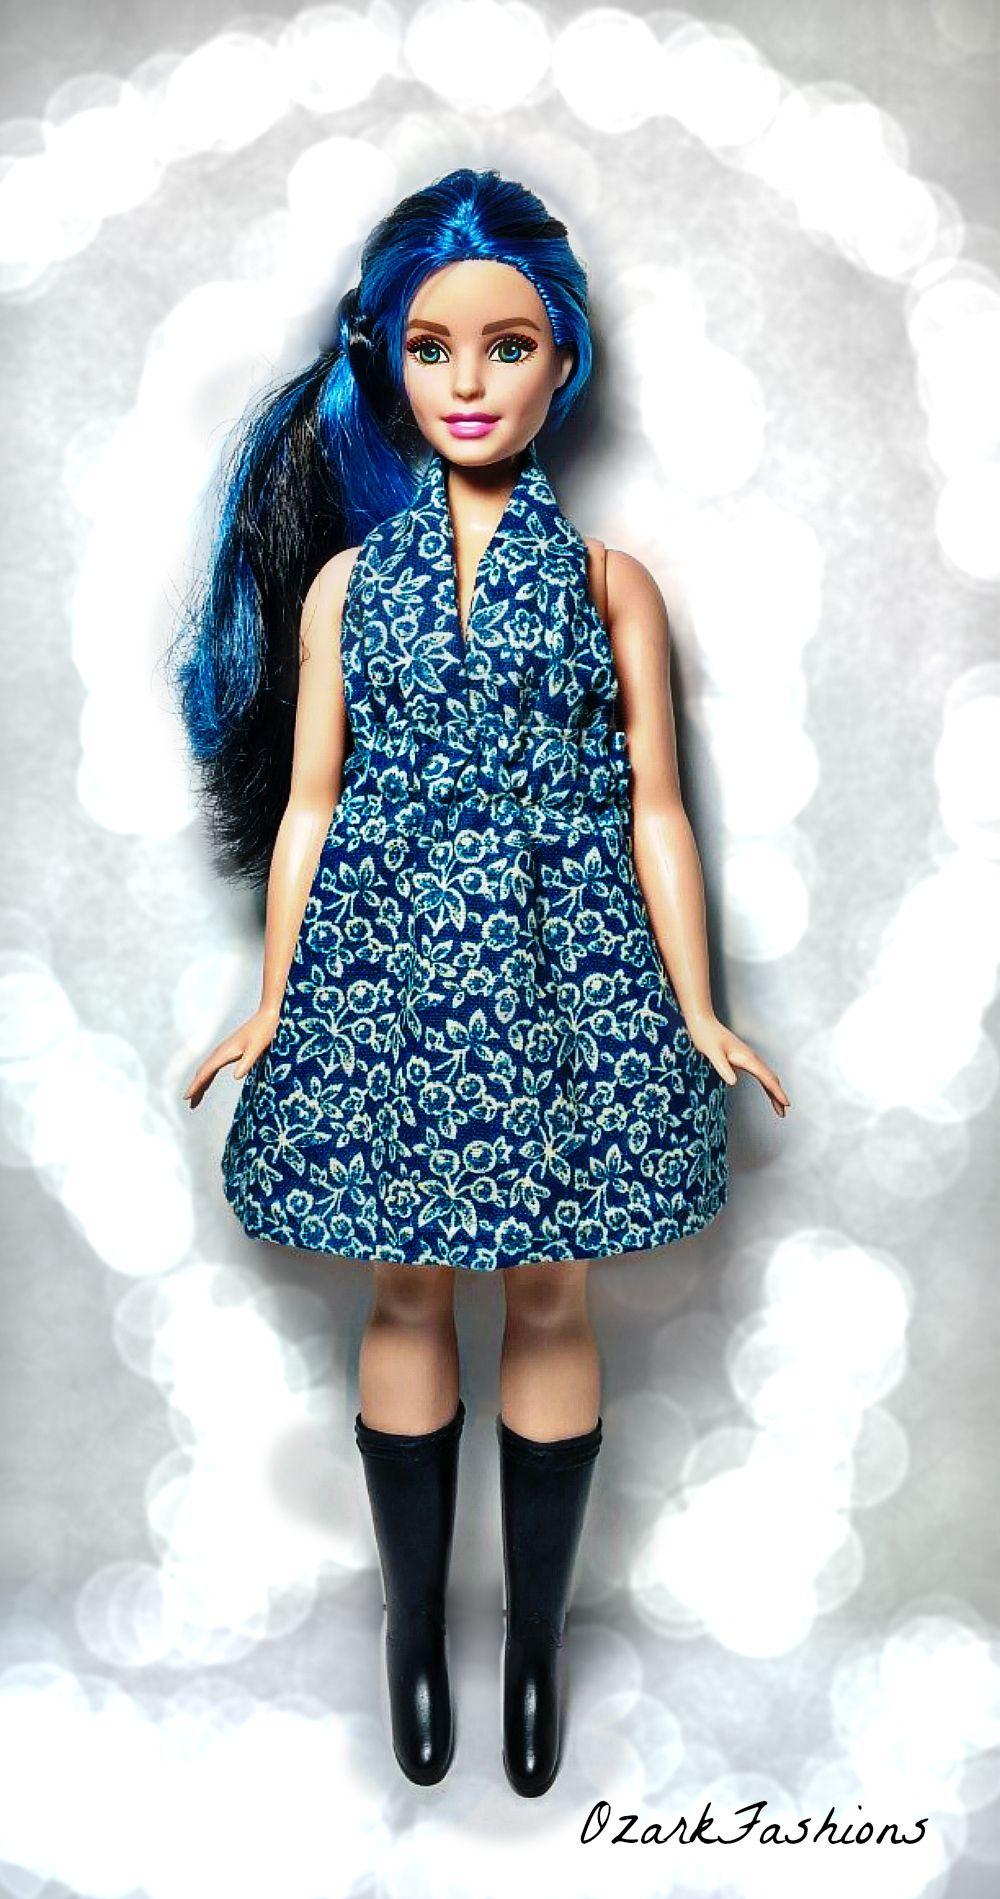 93672a28b7 Curvy Barbie Doll Clothes - Handmade Curvy Barbie Dress for the plus sized  Barbie Doll.